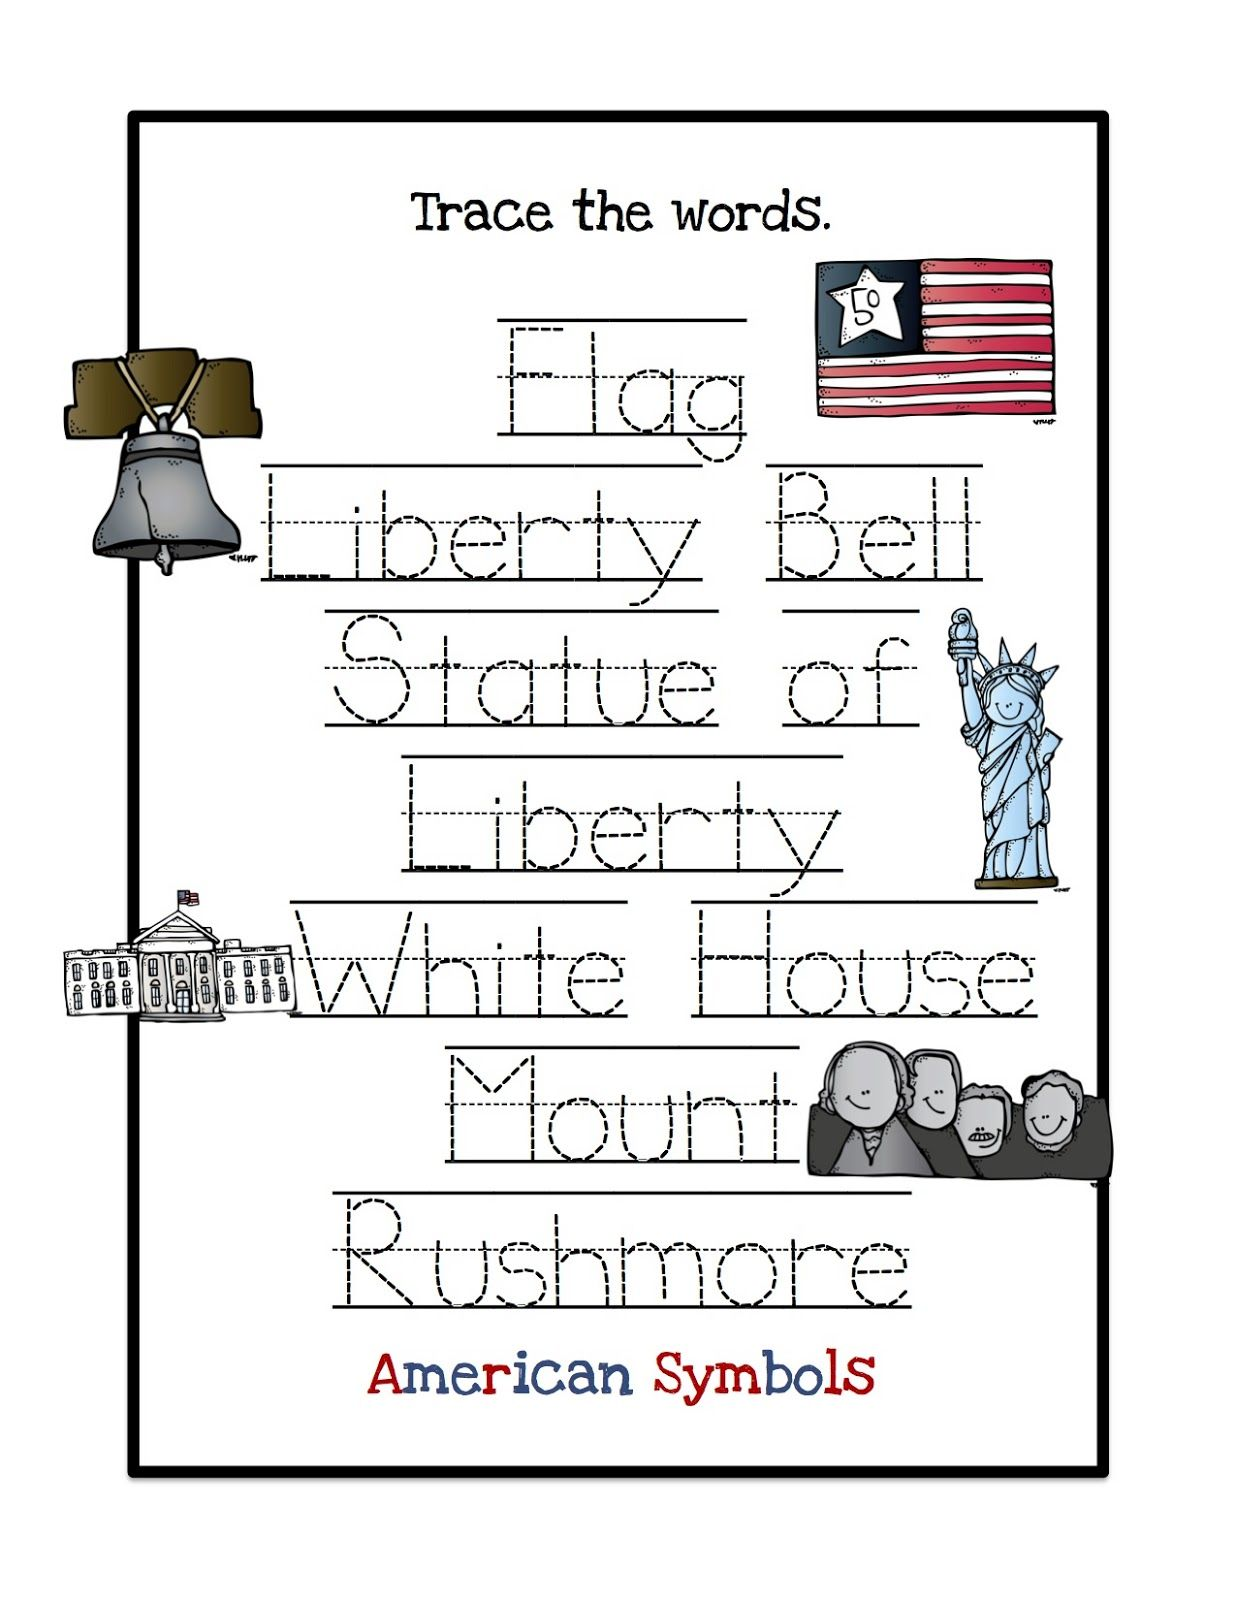 small resolution of Nat'l symbols word trace   American symbols